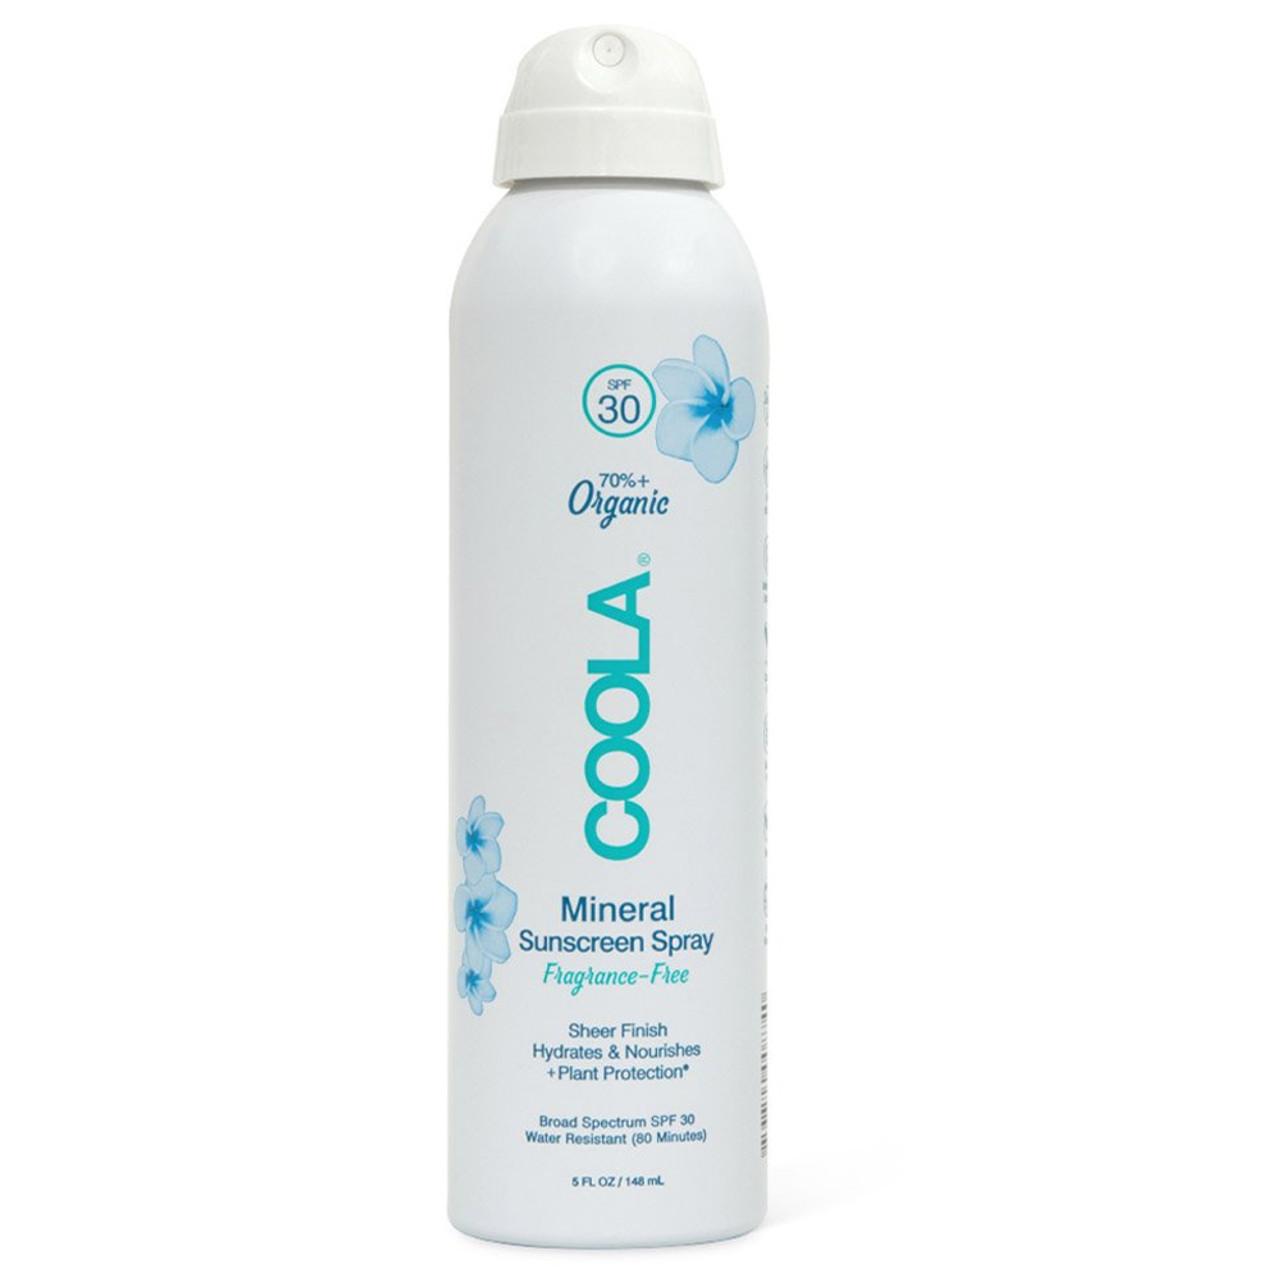 Coola Mineral Body Sunscreen Spray SPF30 - 5 oz Fragrance Free